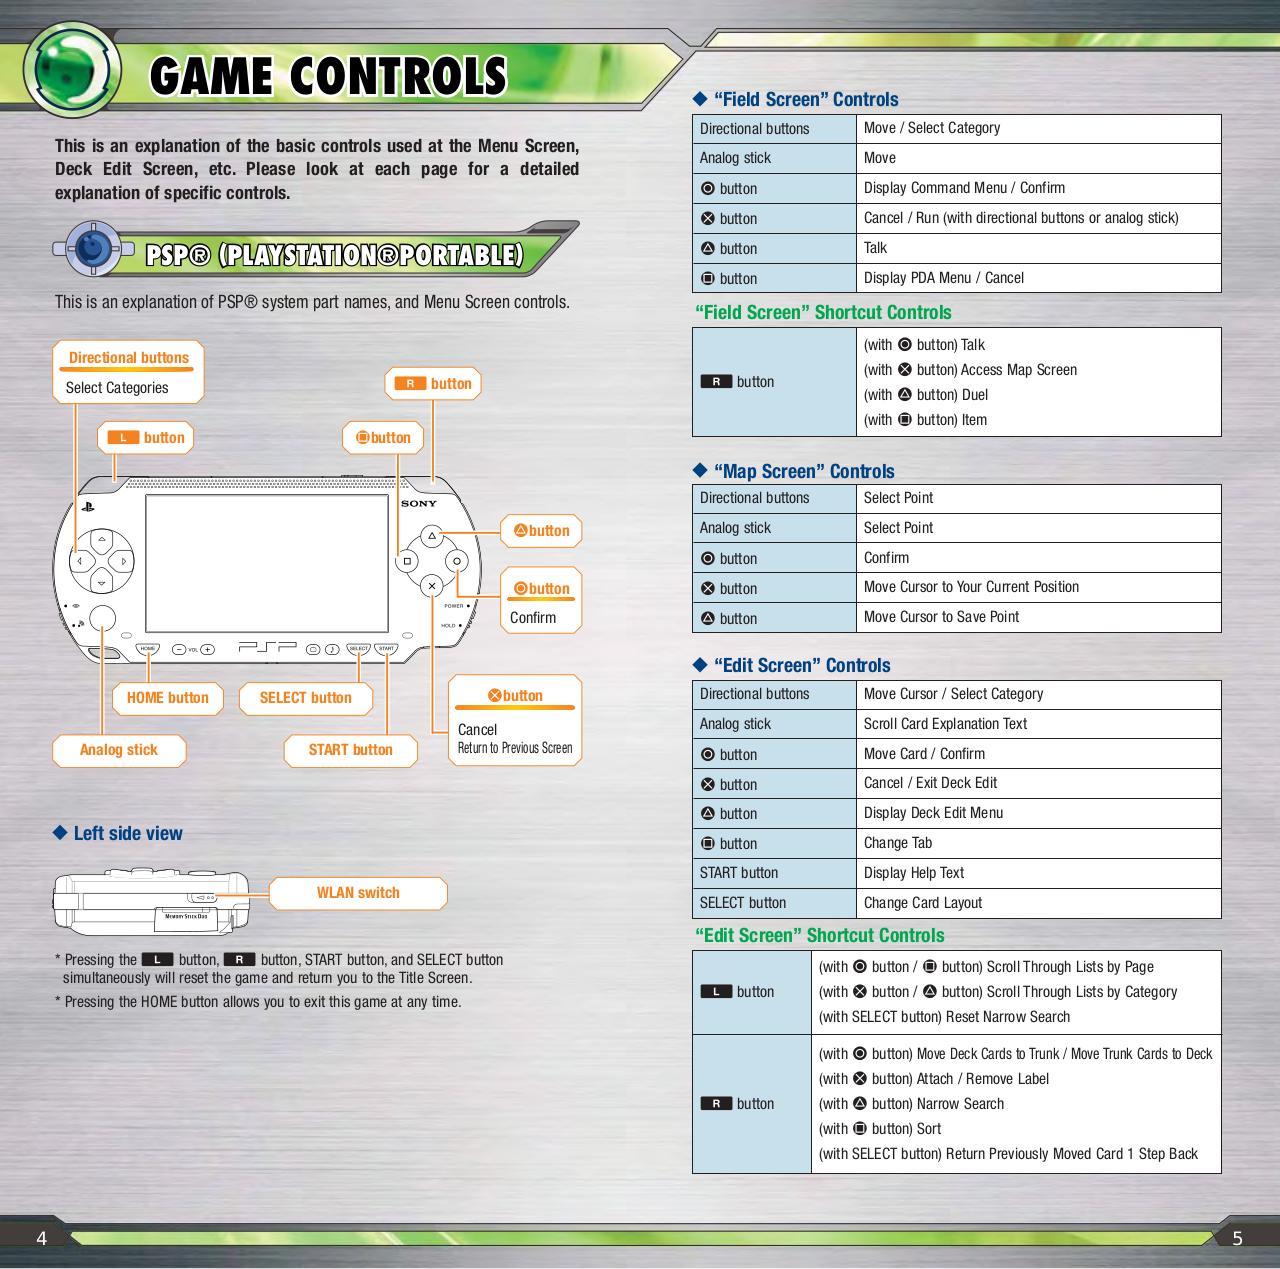 playstation portable manuals